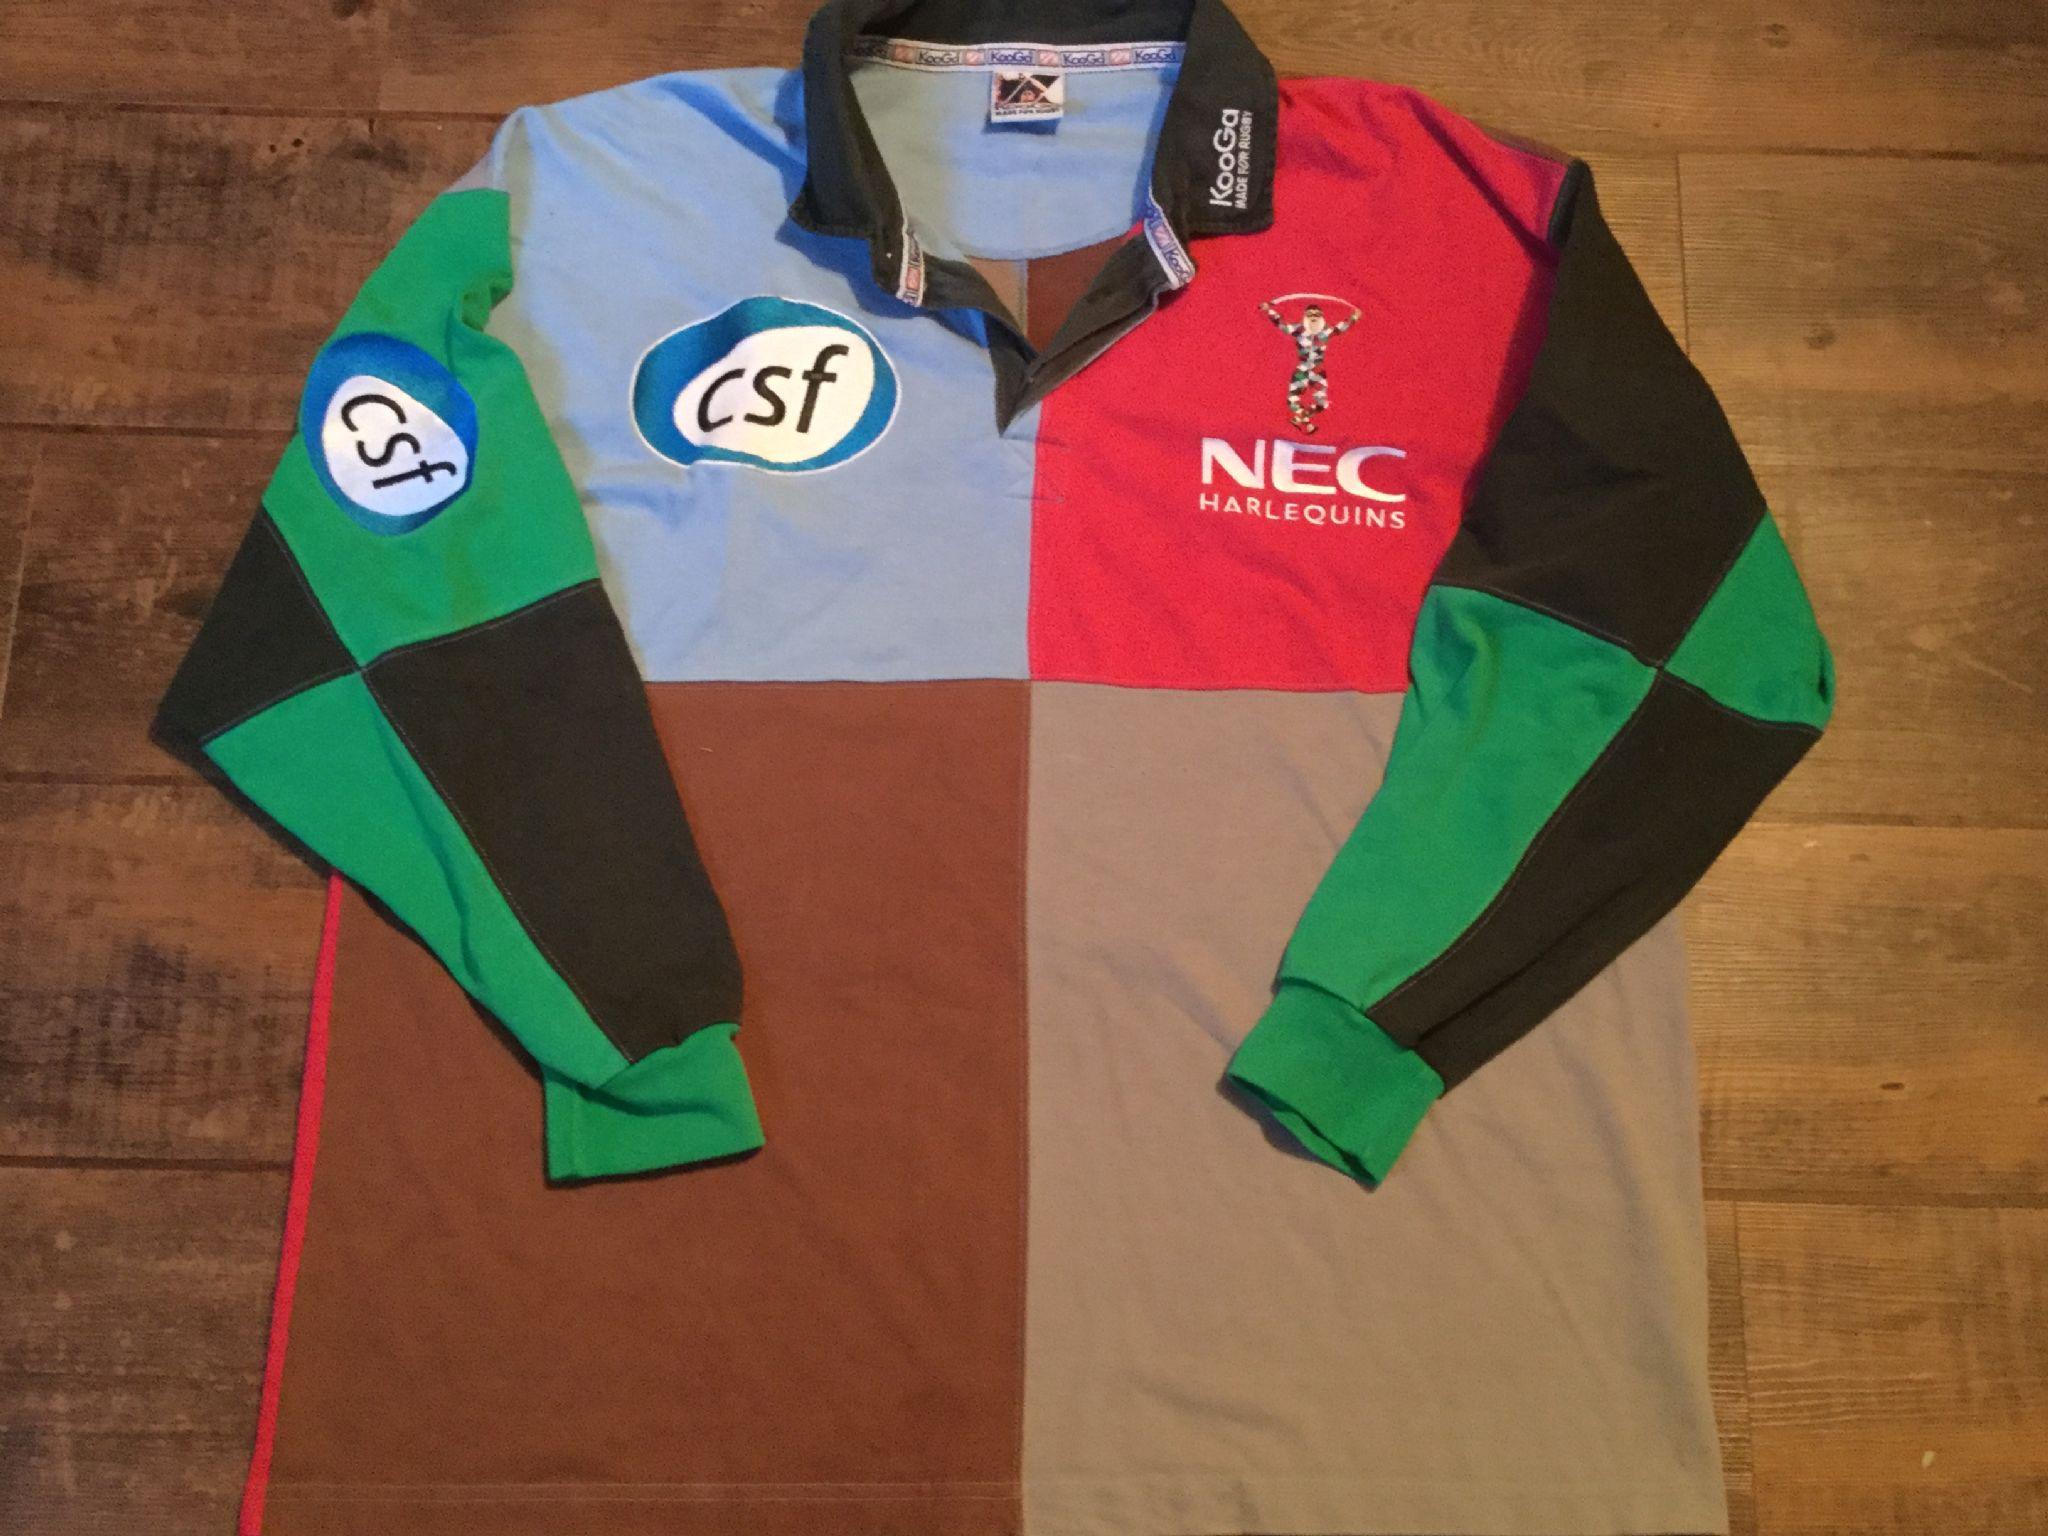 9625881faff 2003 2004 Harlequins L/s Rugby Union Shirt Adults 2XL XXL Jersey